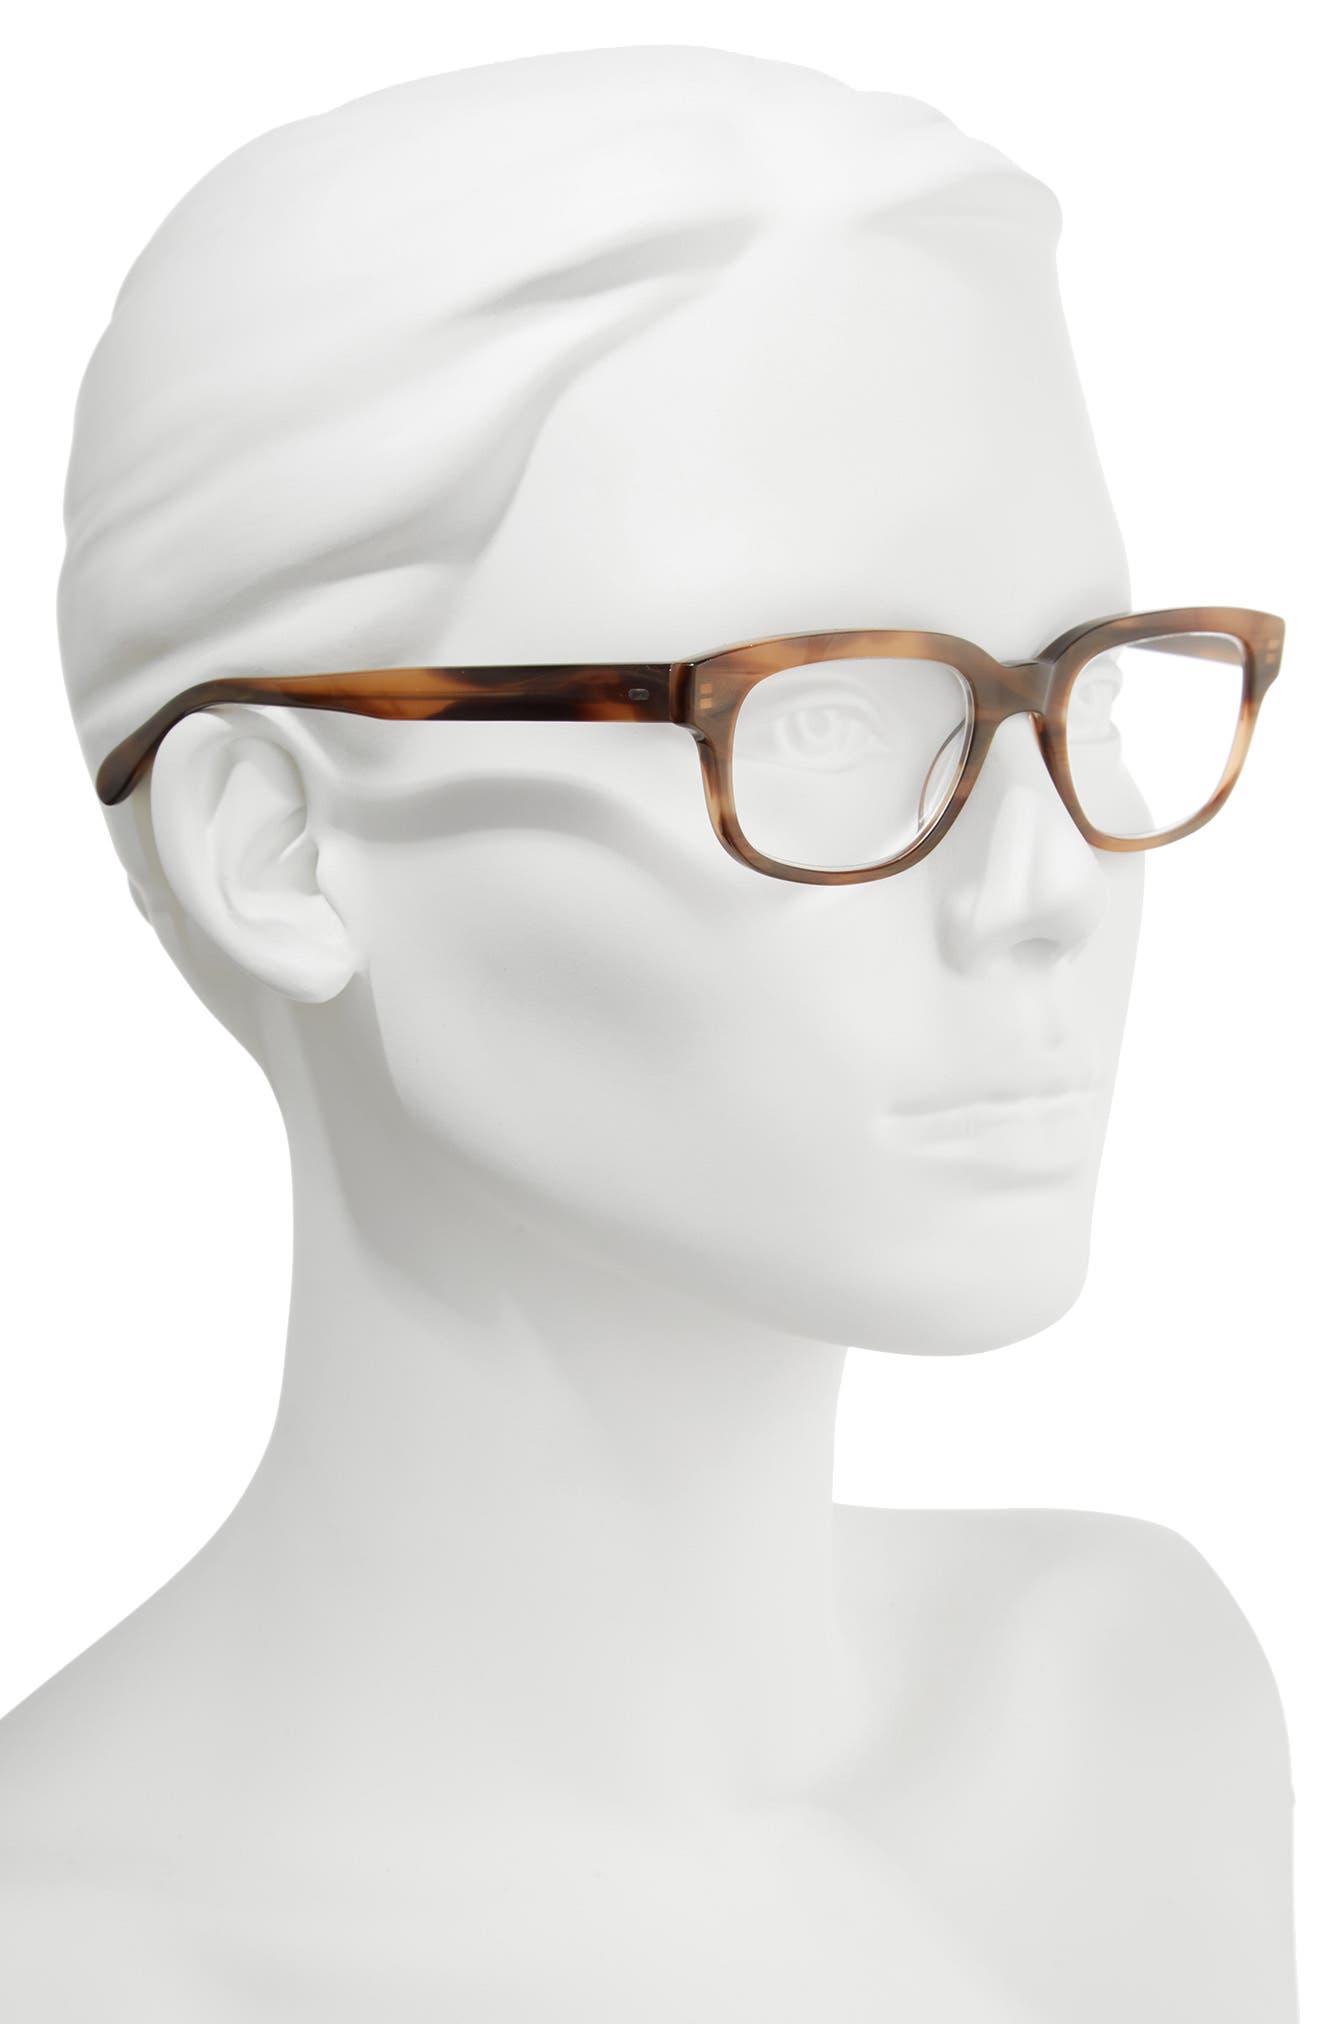 Corrine McCormack Brandy 51mm Reading Glasses,                             Alternate thumbnail 2, color,                             Brown